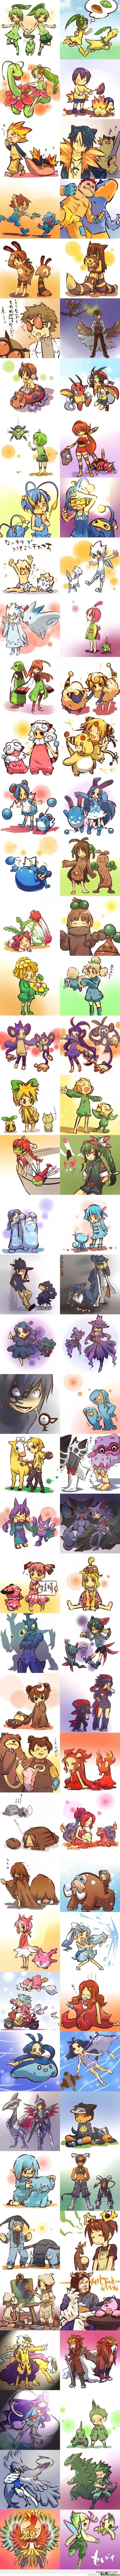 If Pokémon were humans (II)